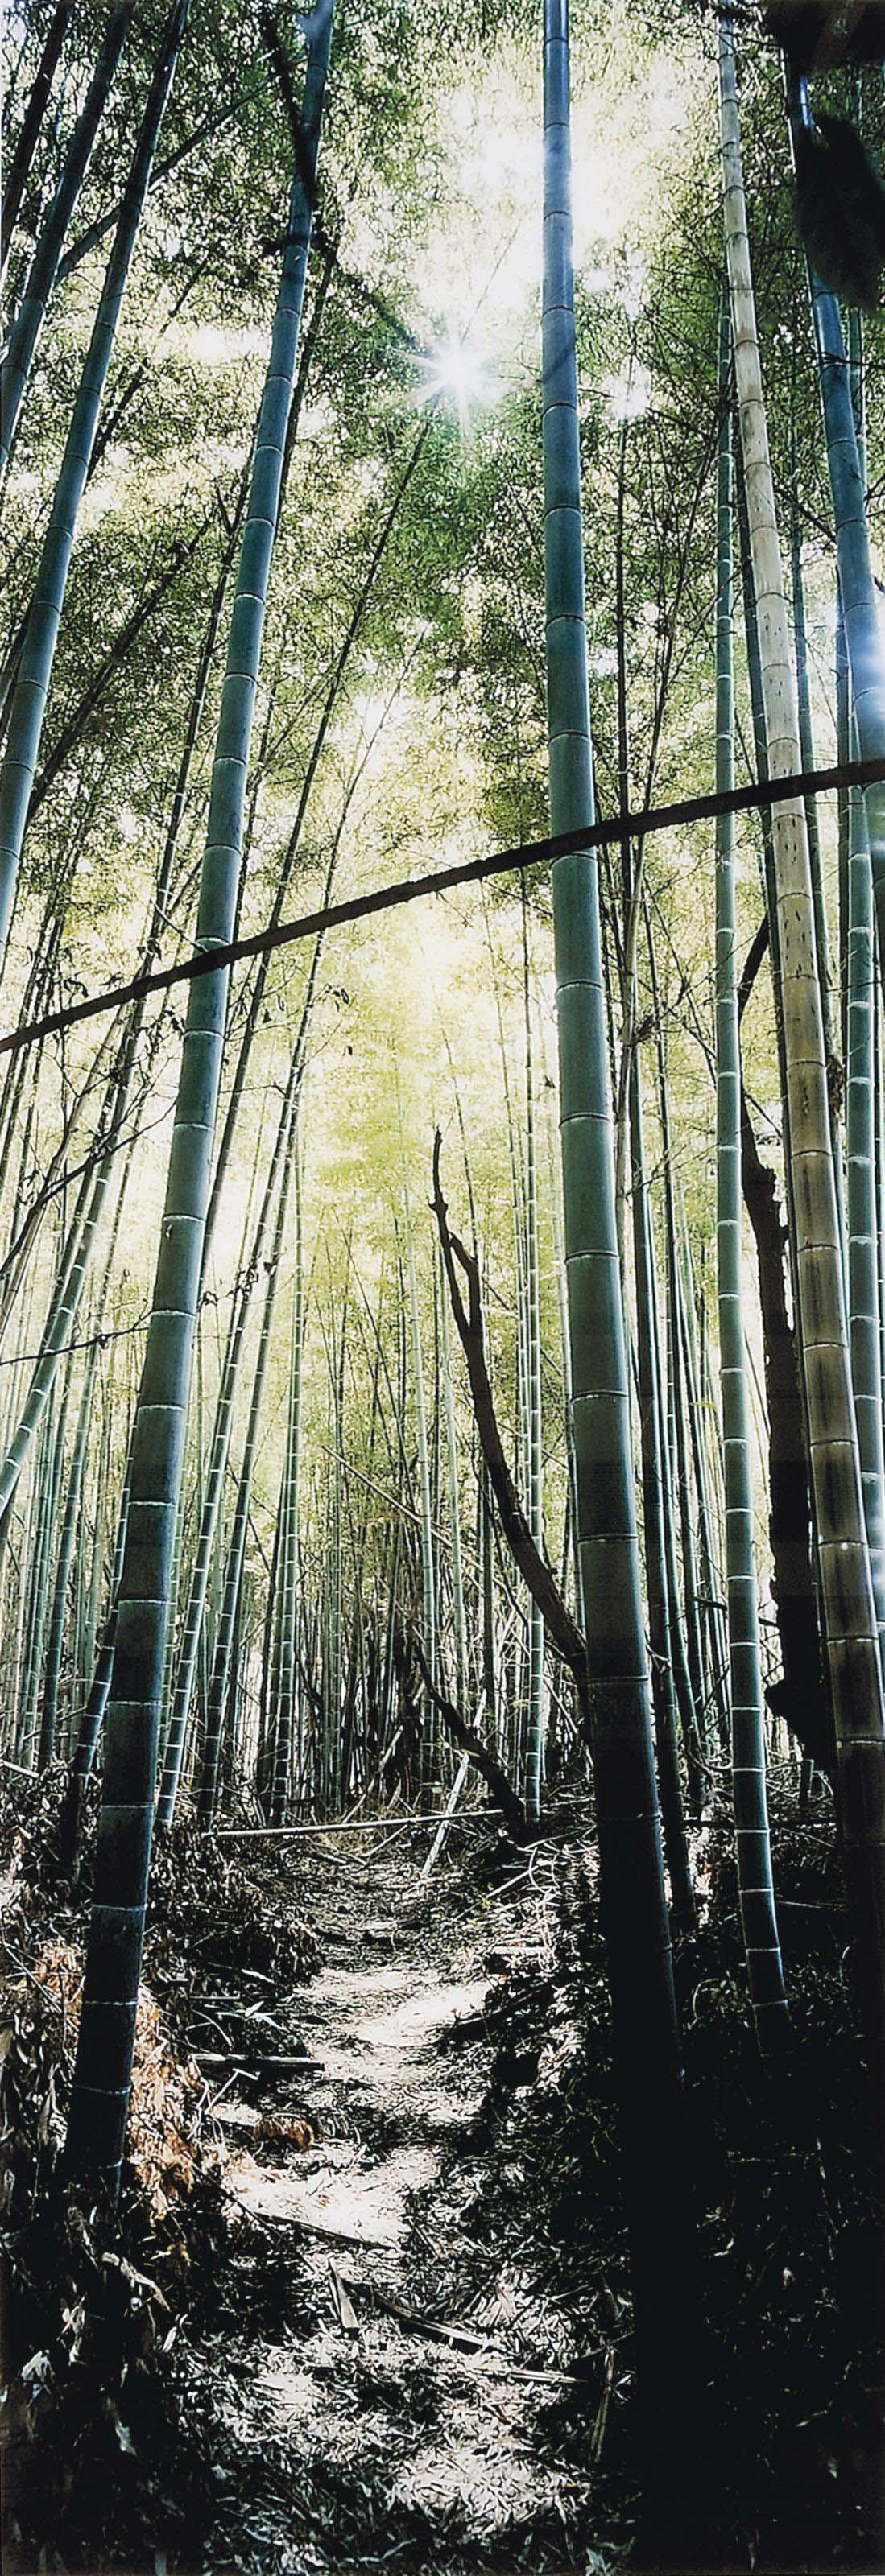 Bamboo Forest, Nara, Japon, 2000